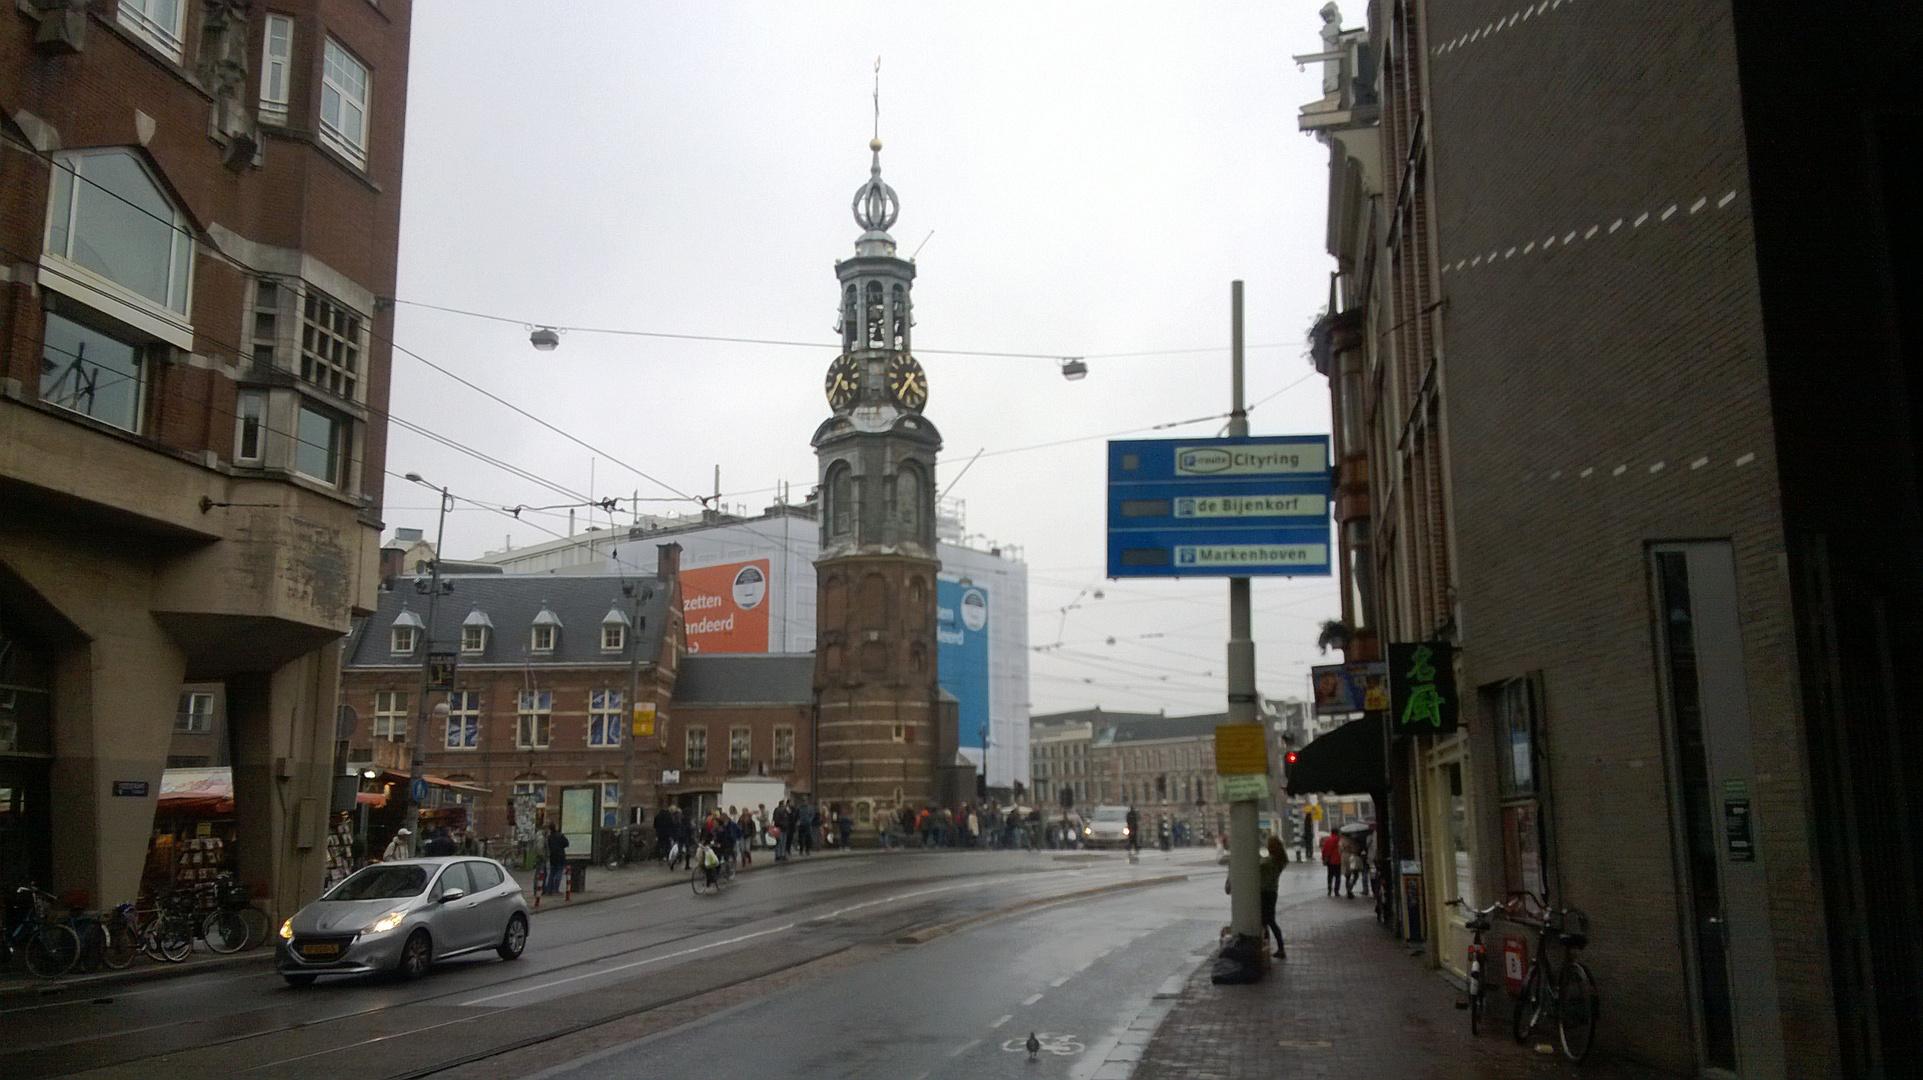 Piazza dam amsterdam foto immagini paesaggi amsteram for Ostello amsterdam piazza dam